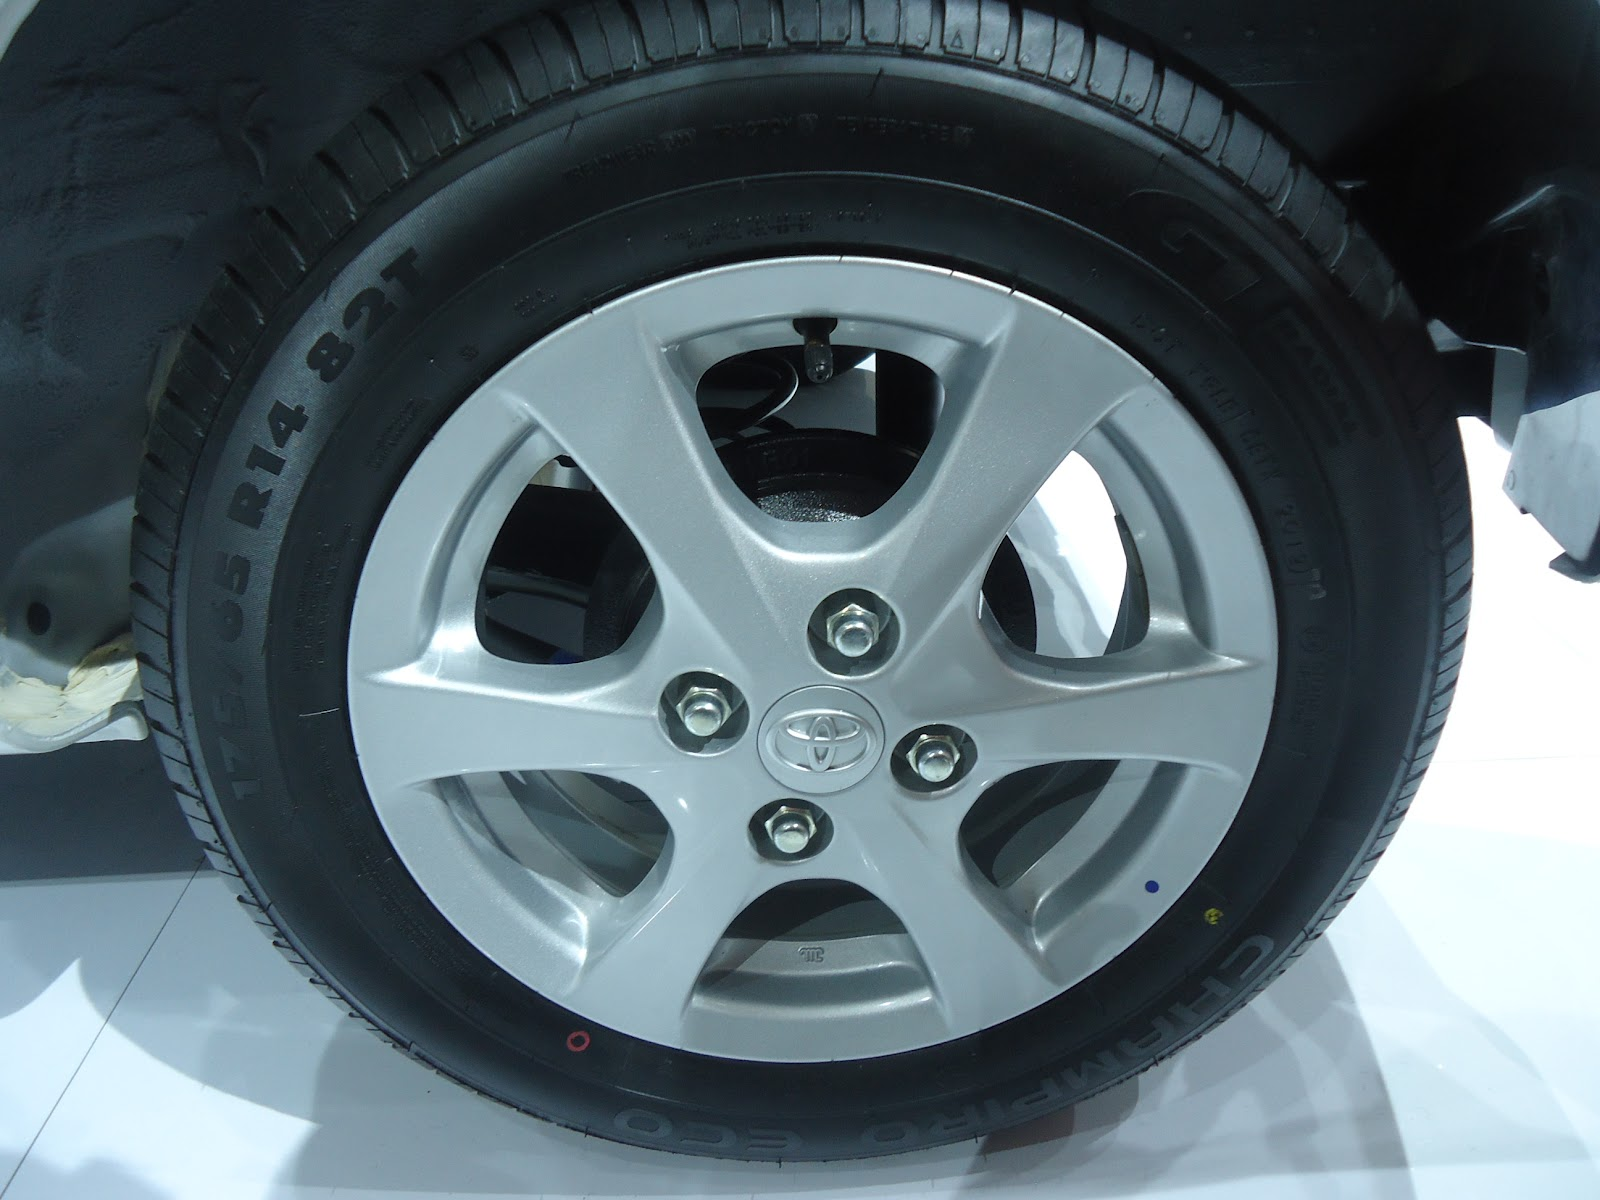 Ukuran Velg New Yaris Trd All Camry 2018 Malaysia Herwono Banyu Alas: Harga Spesifikasi Detail Toyota Agya ...